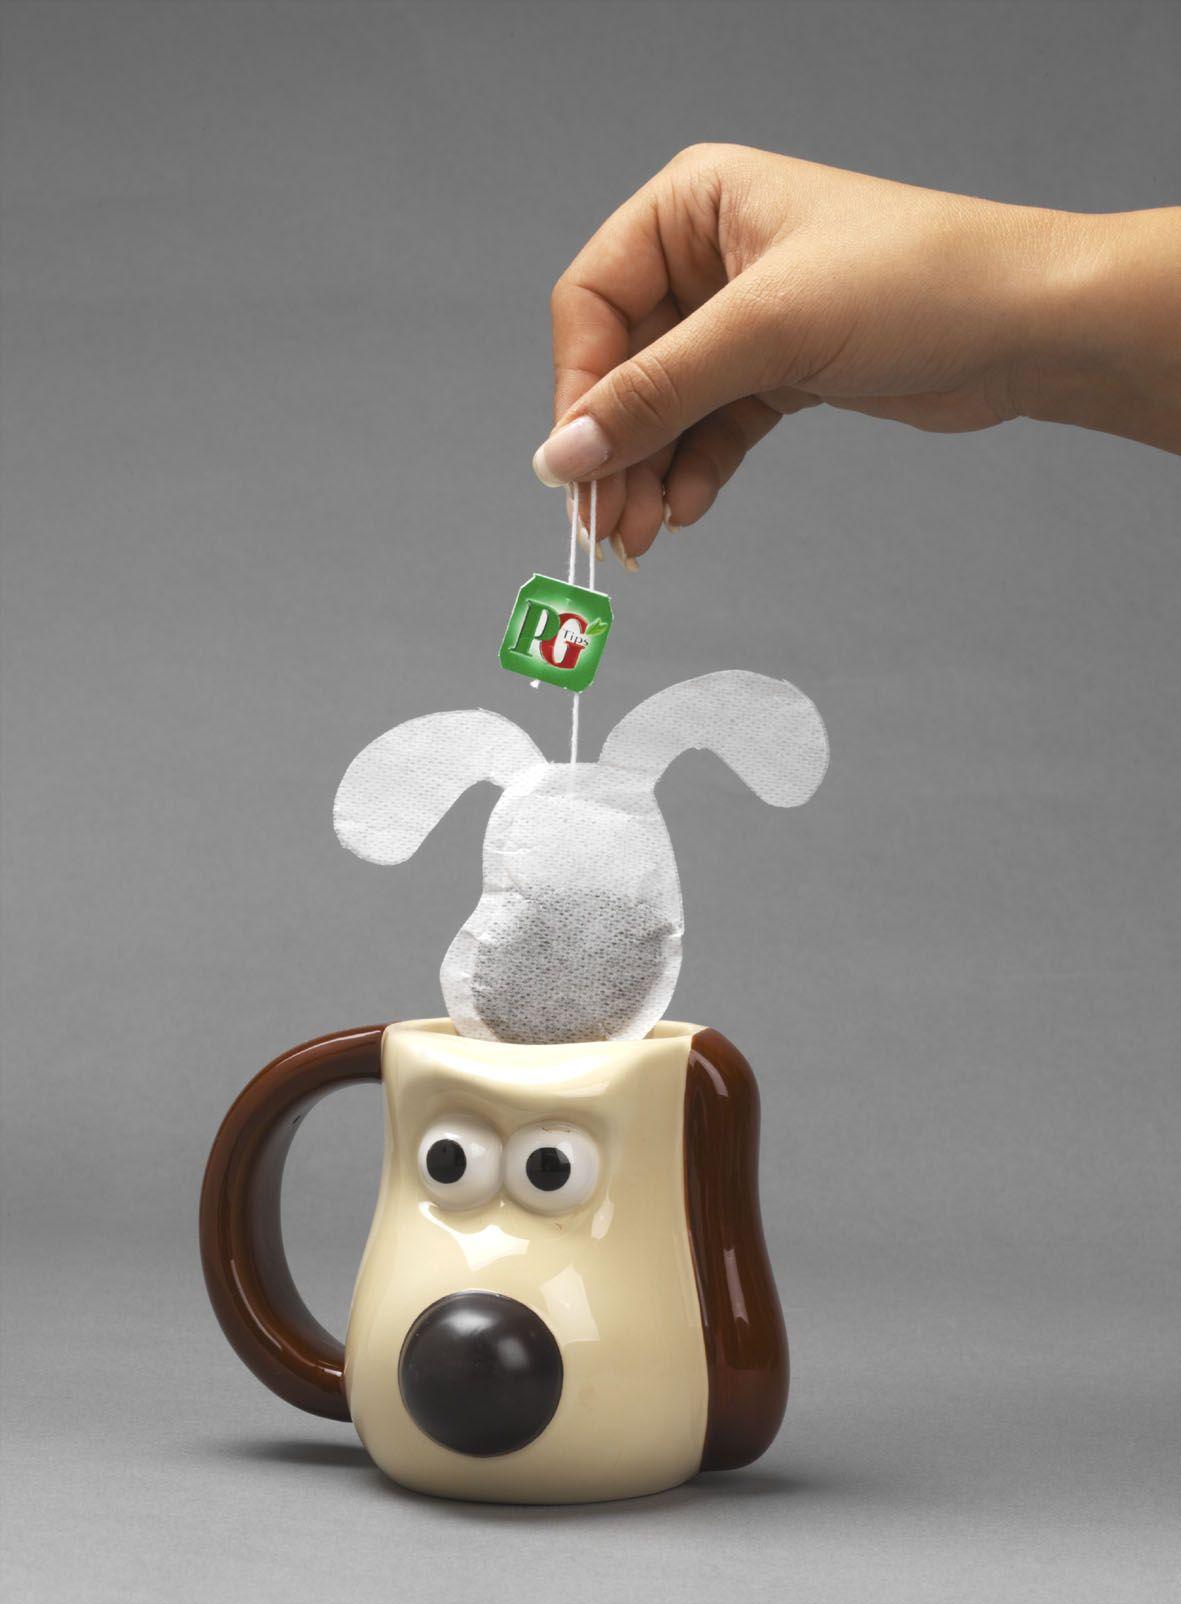 Gromit shaped tea bag for pg tips tea etiquette my tea